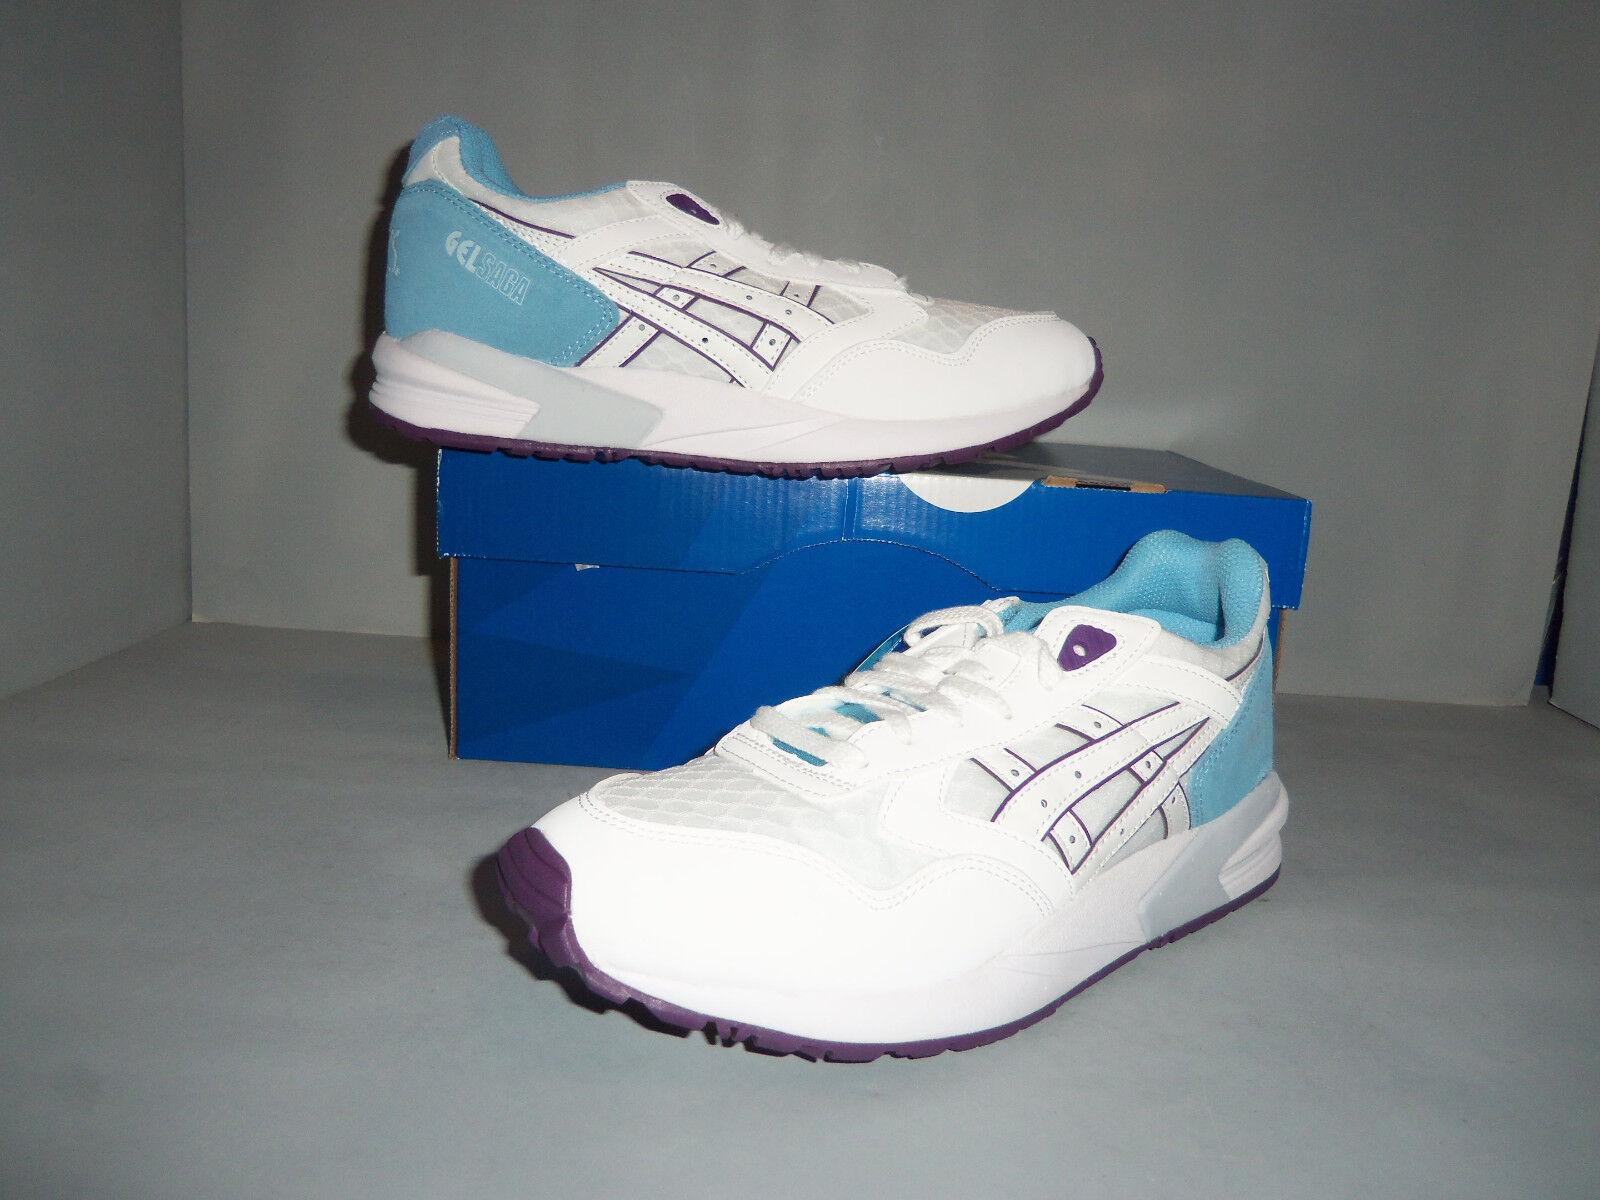 Womens ASICS Tiger Gel-Saga White Sizes New NIB Leather Suede Mesh H5P8L 0101